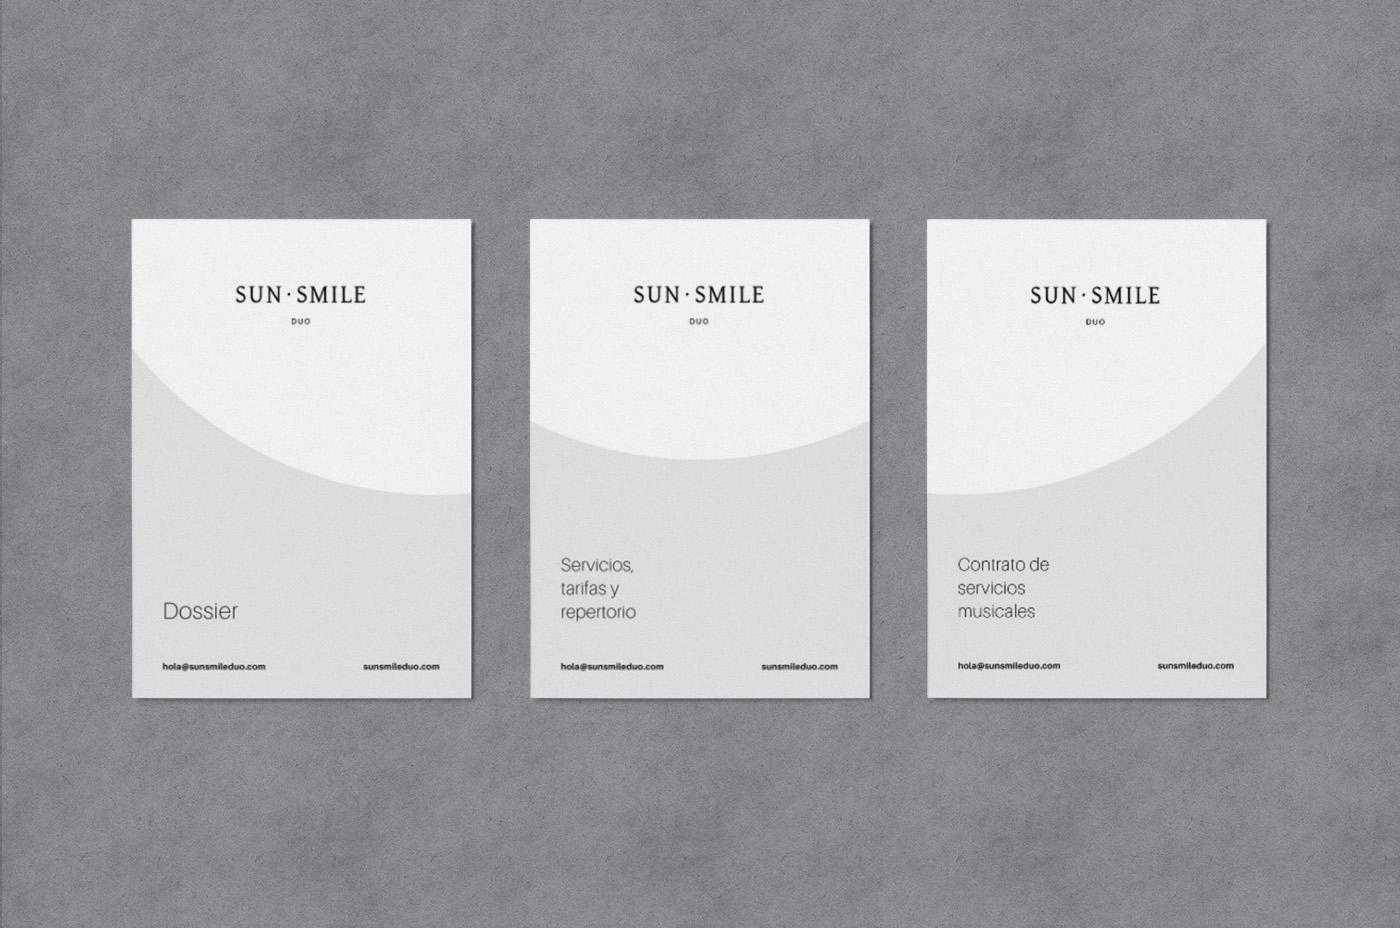 Sun Smile Diseño gráfico dossier